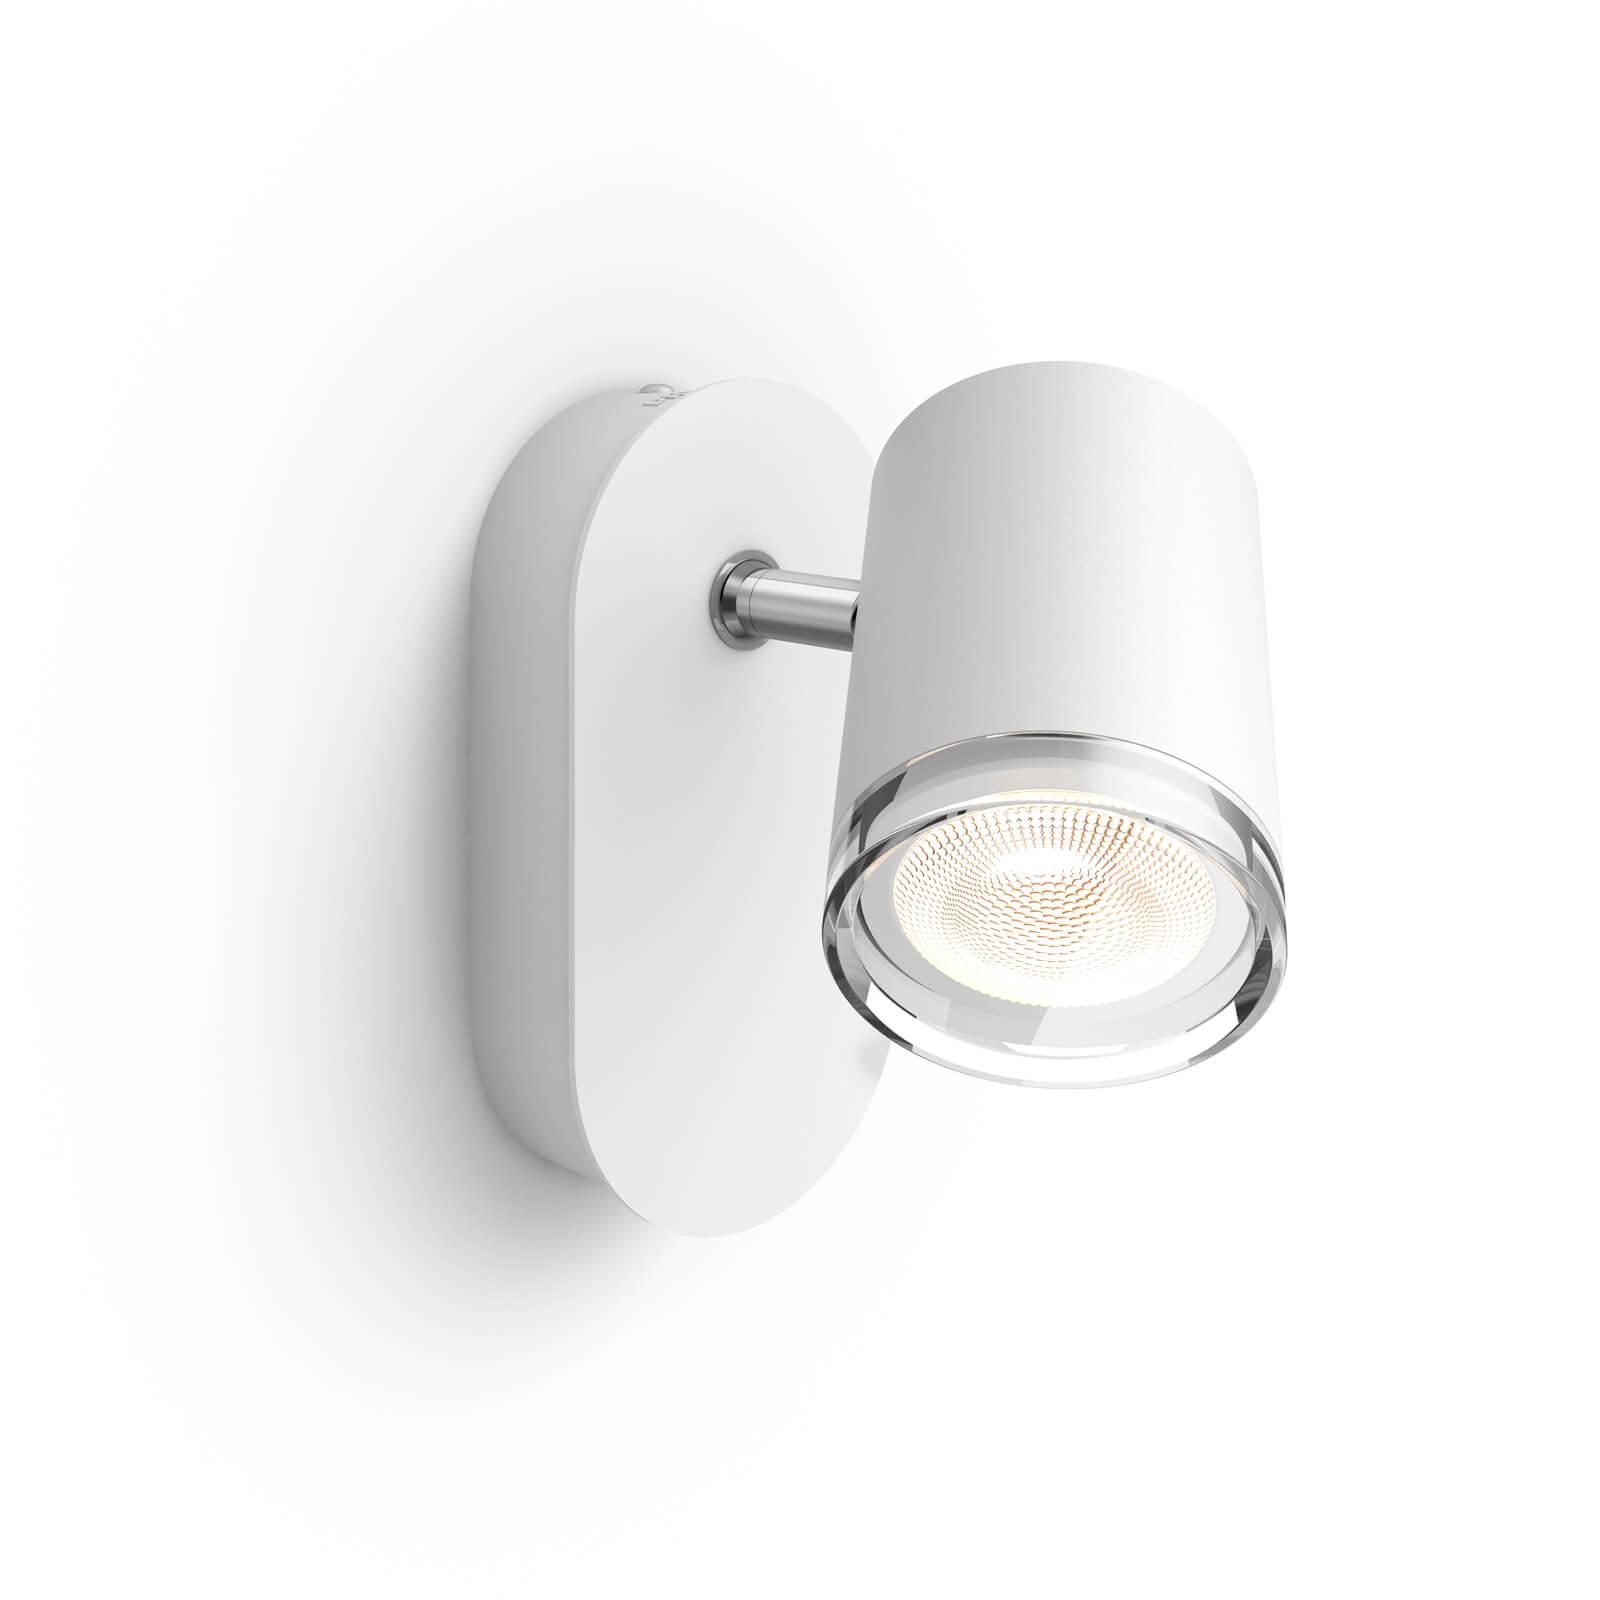 philips hue adore bathroom spot wit 1 spot white ambiance. Black Bedroom Furniture Sets. Home Design Ideas